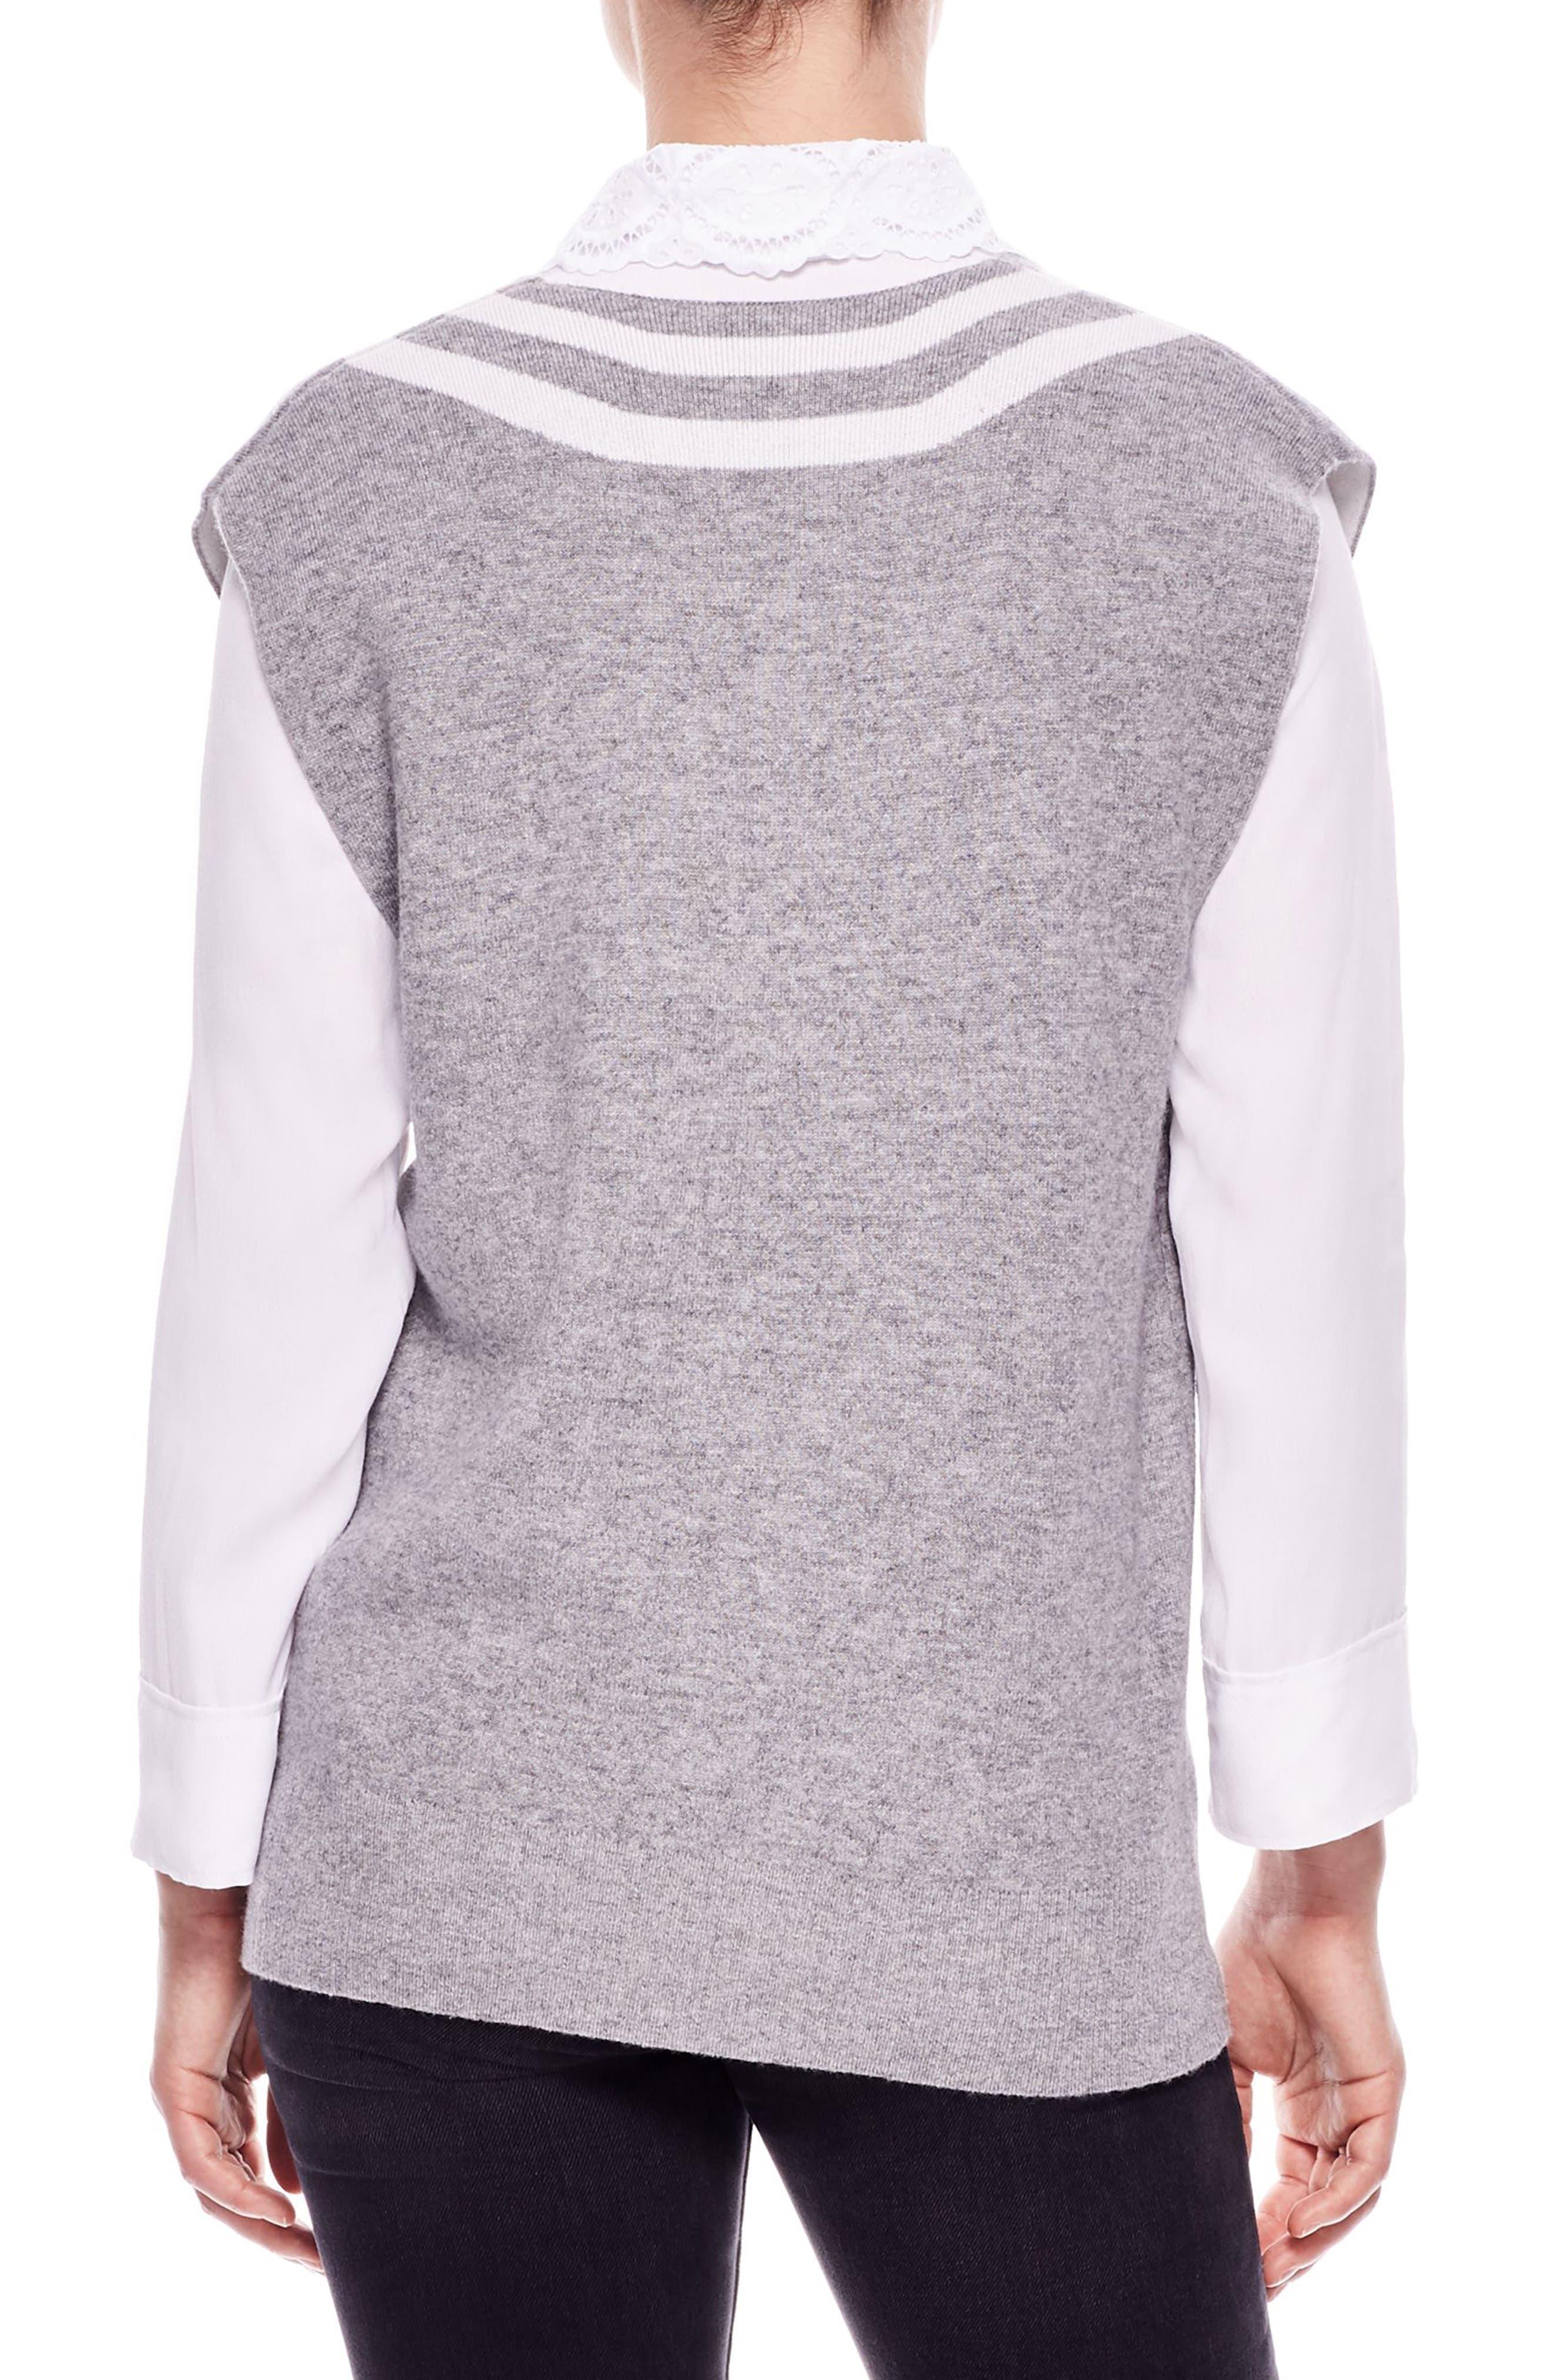 Tabby Sweater,                             Alternate thumbnail 2, color,                             020